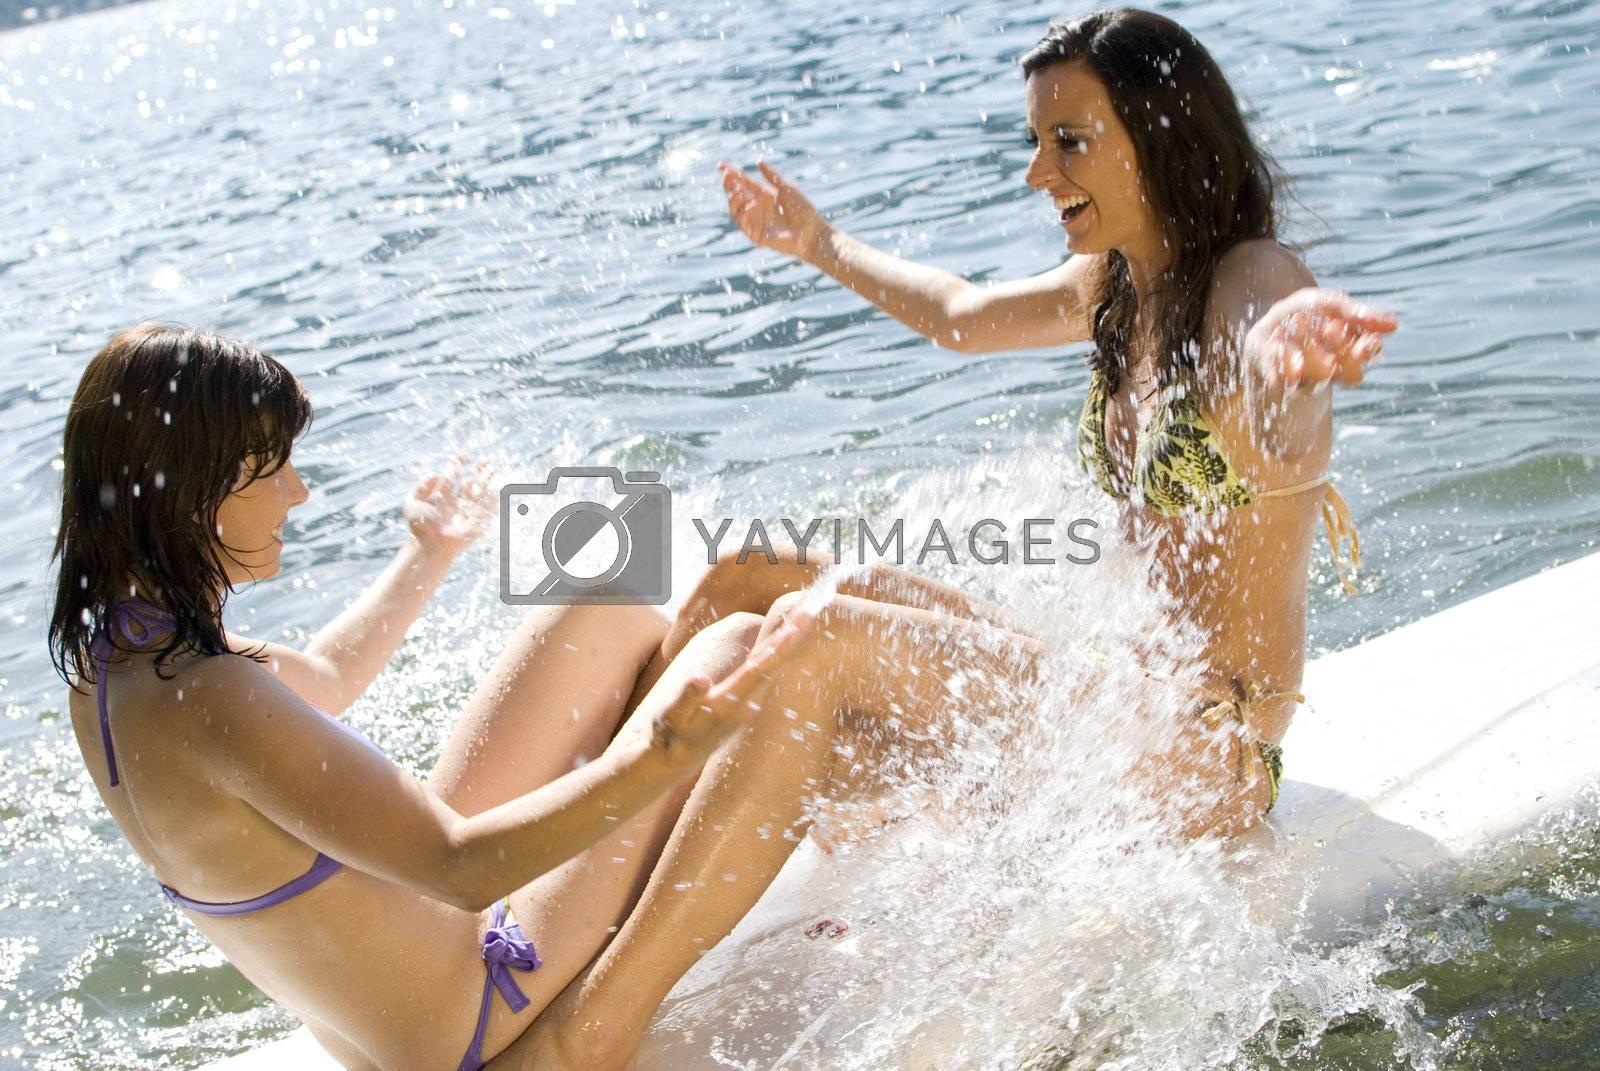 Girls having fun on surfboard